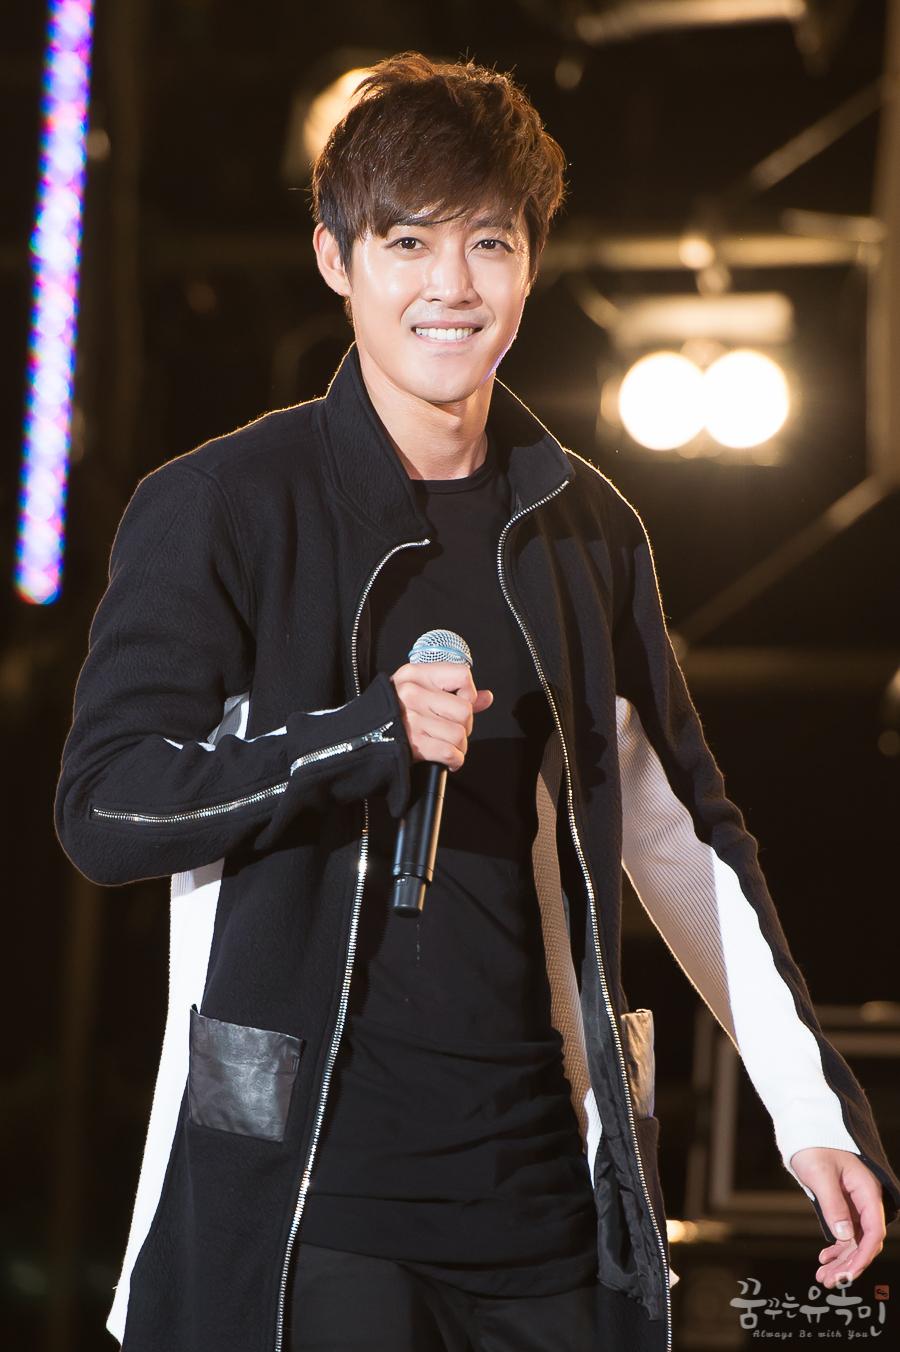 [HD Photos - nomad0606] Kim Hyun Joong Aomori Shock On! [2014.09.27]